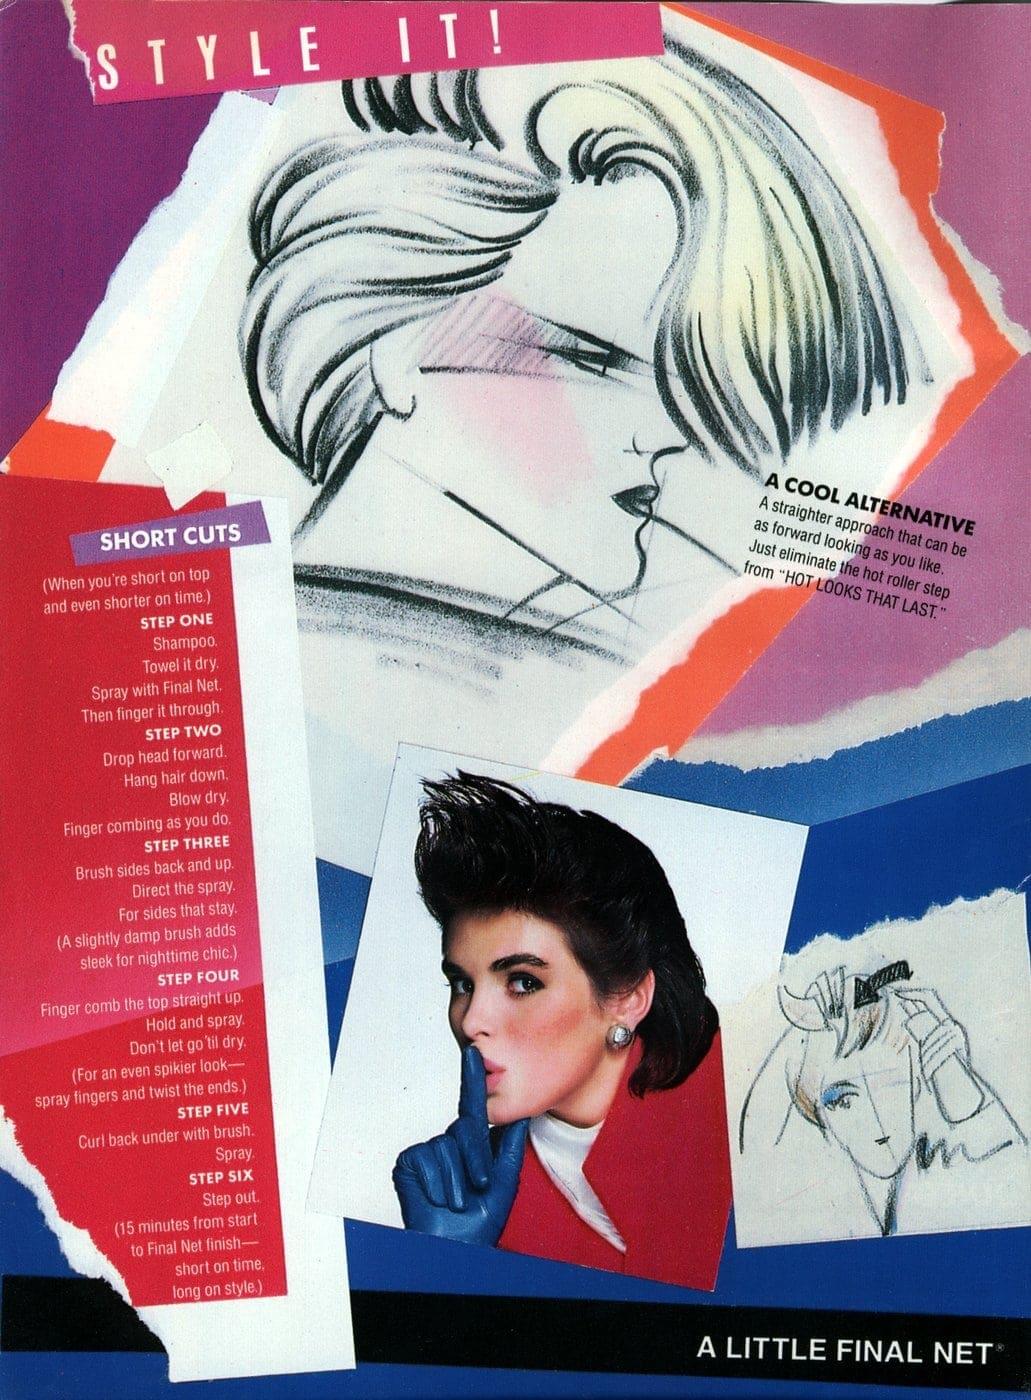 Final Nethairspray A cool alternative 1985 - Vintage